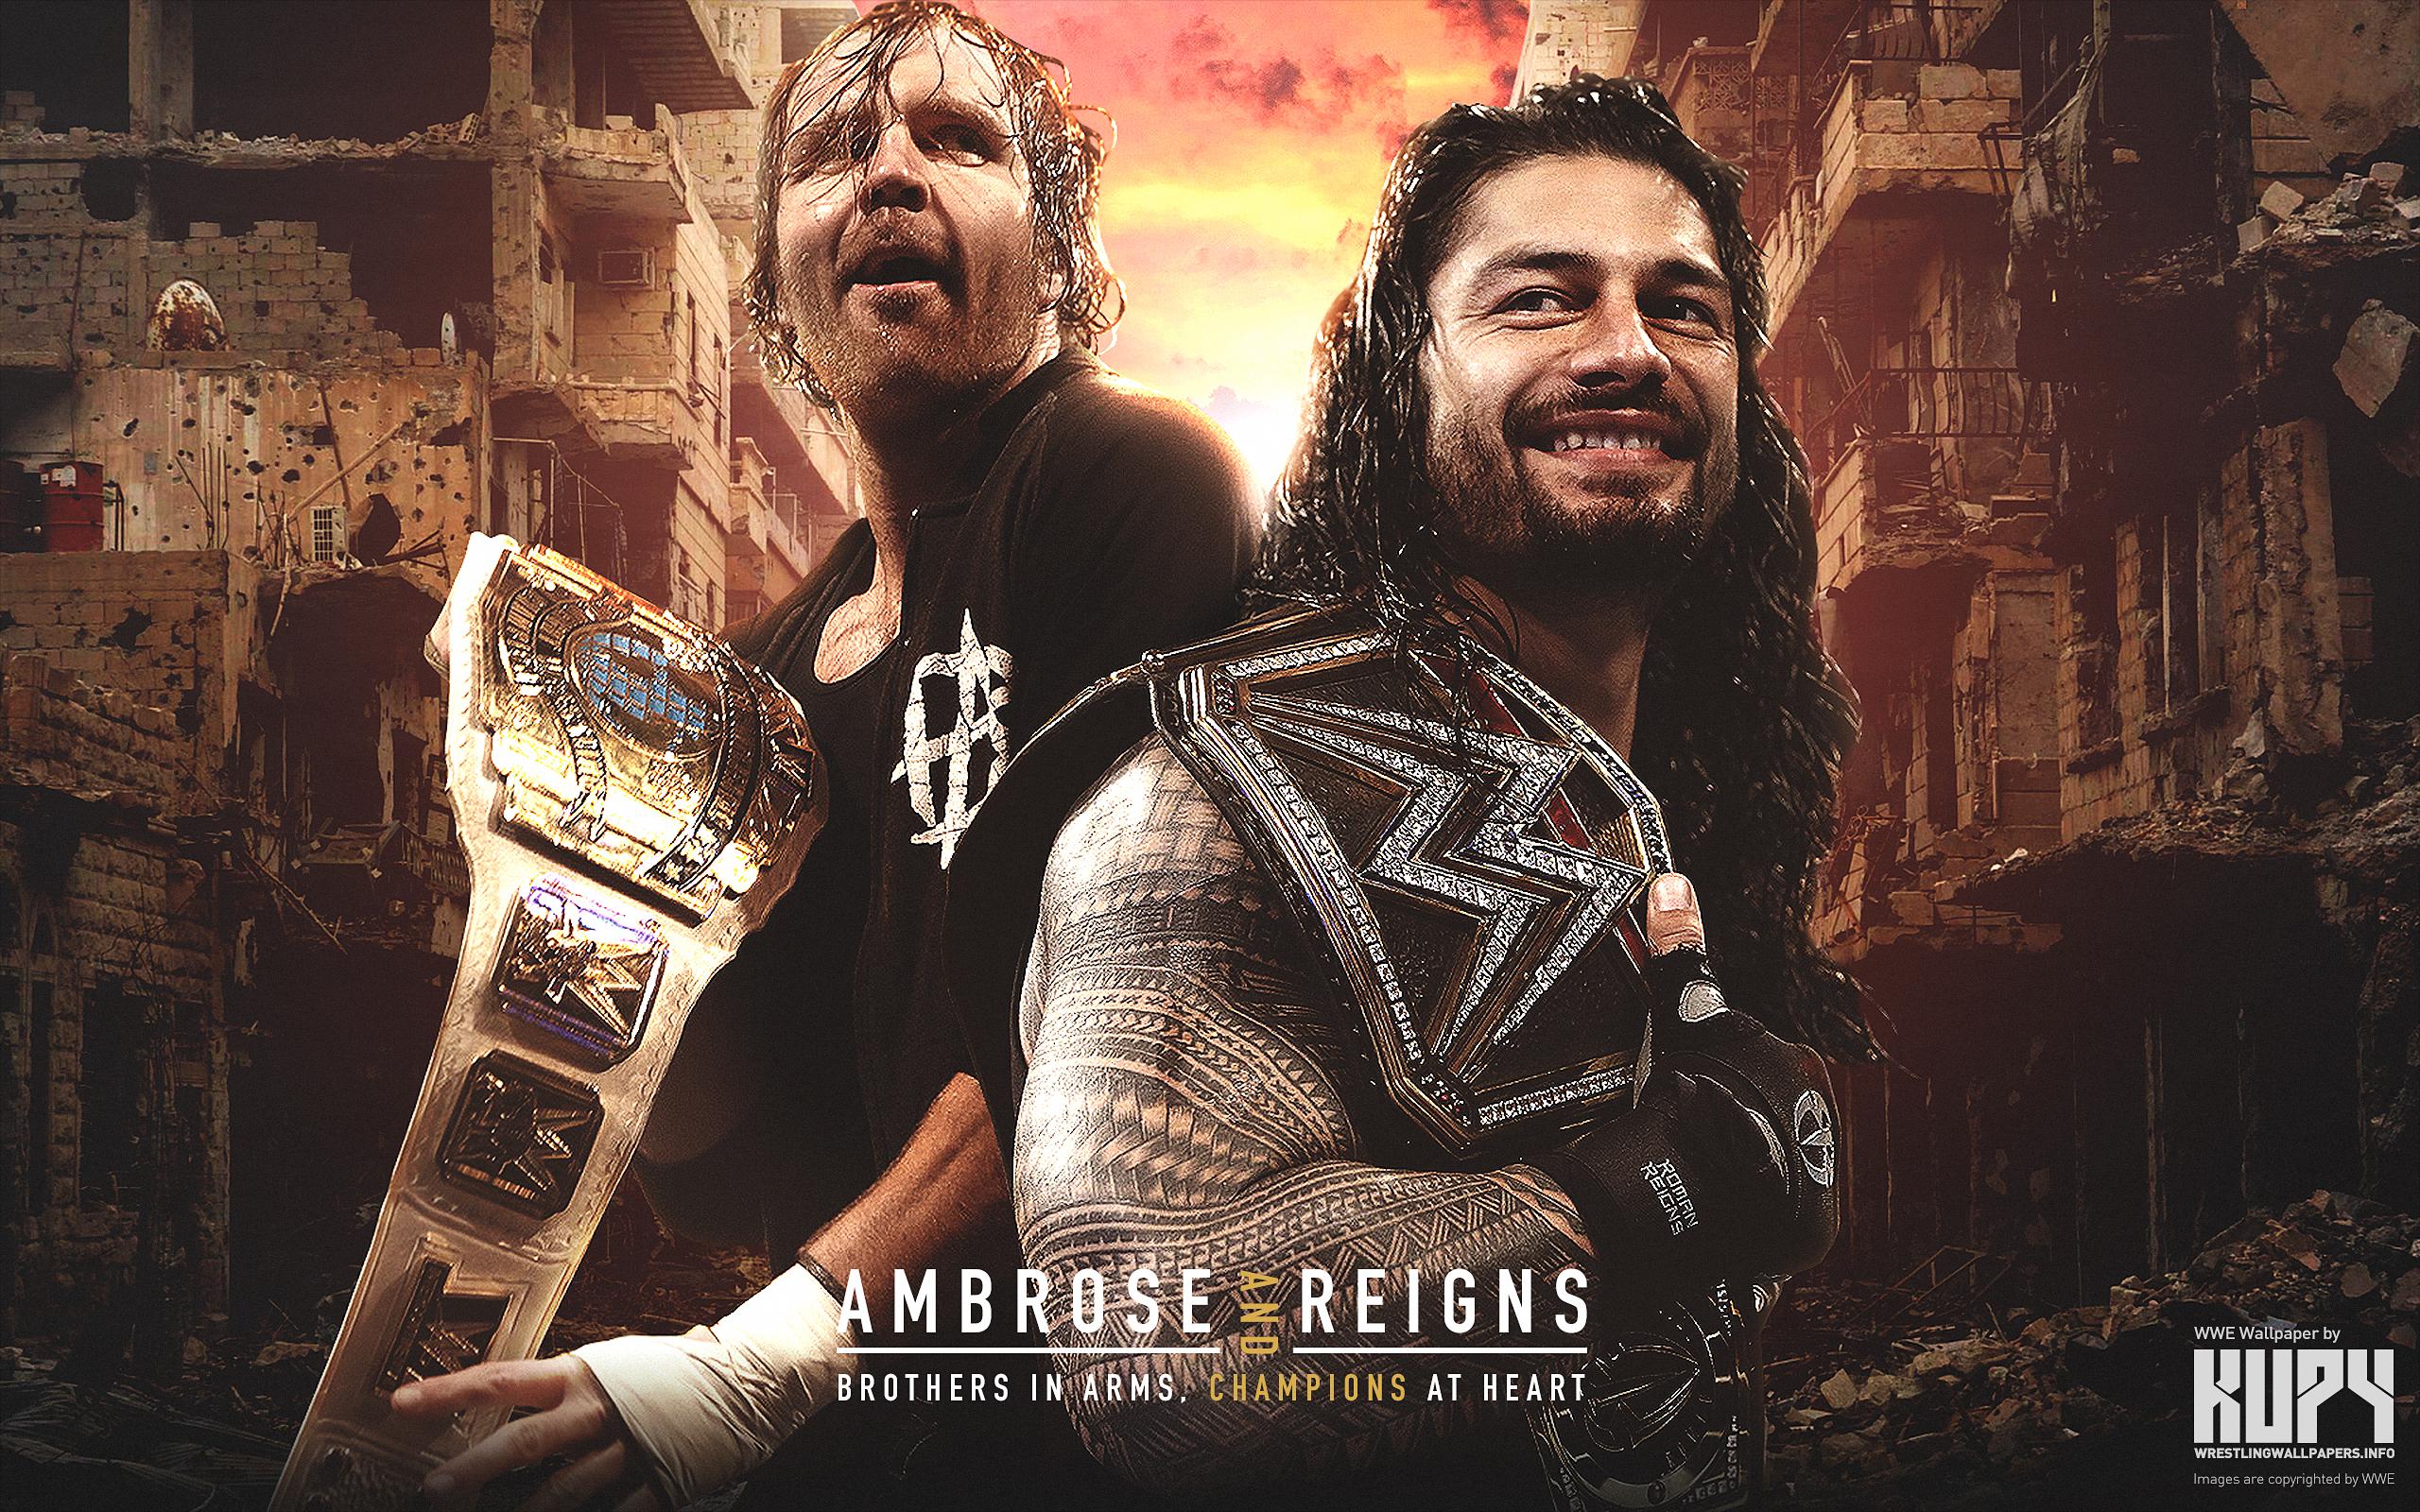 New Dean Ambrose Roman Reigns Champions Wallpaper Kupy